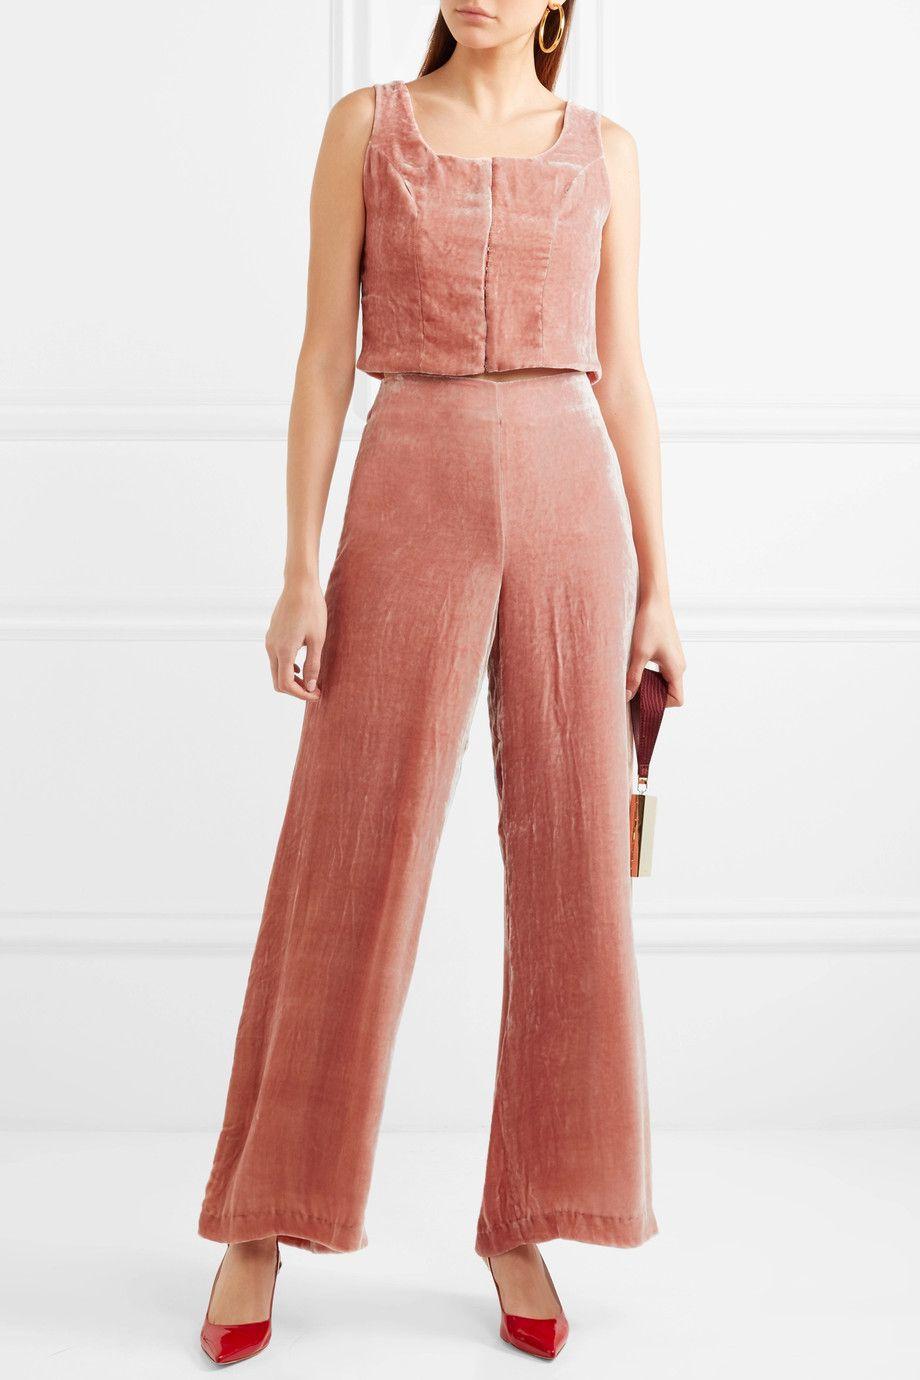 Staud crushed velvet pink pants